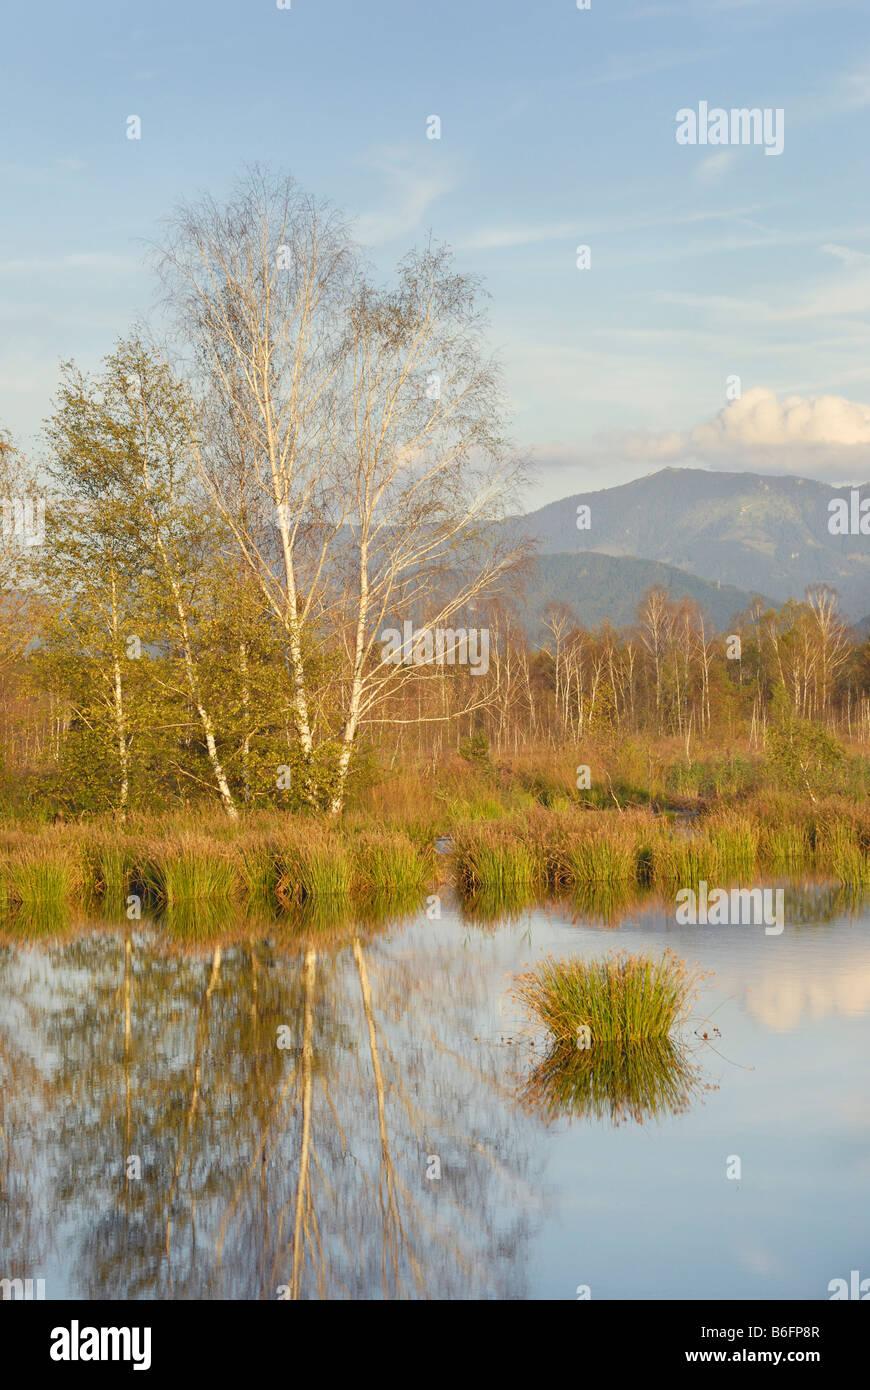 Marsh landscape with pond and birch grove, Alps at back, Nicklheim, alpine upland, Bavaria, Germany, Europe Stock Photo